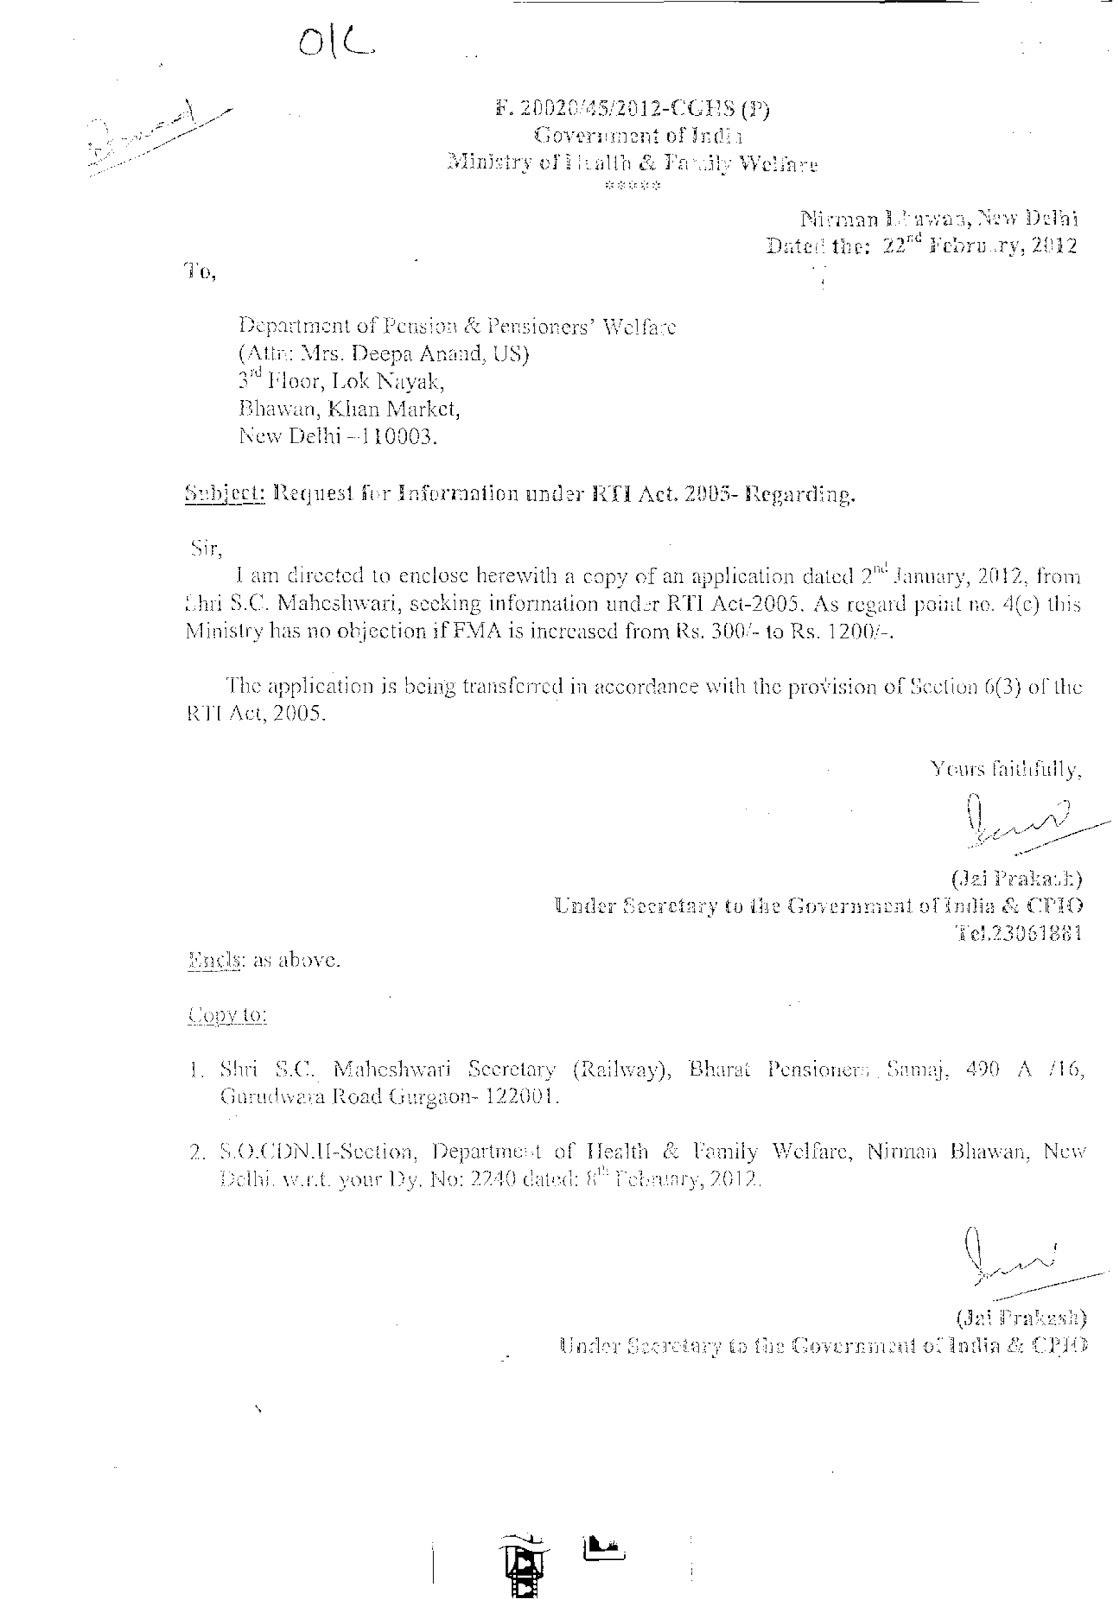 Pensioners Samaj: Ministry of Health & family Welfare has no ...